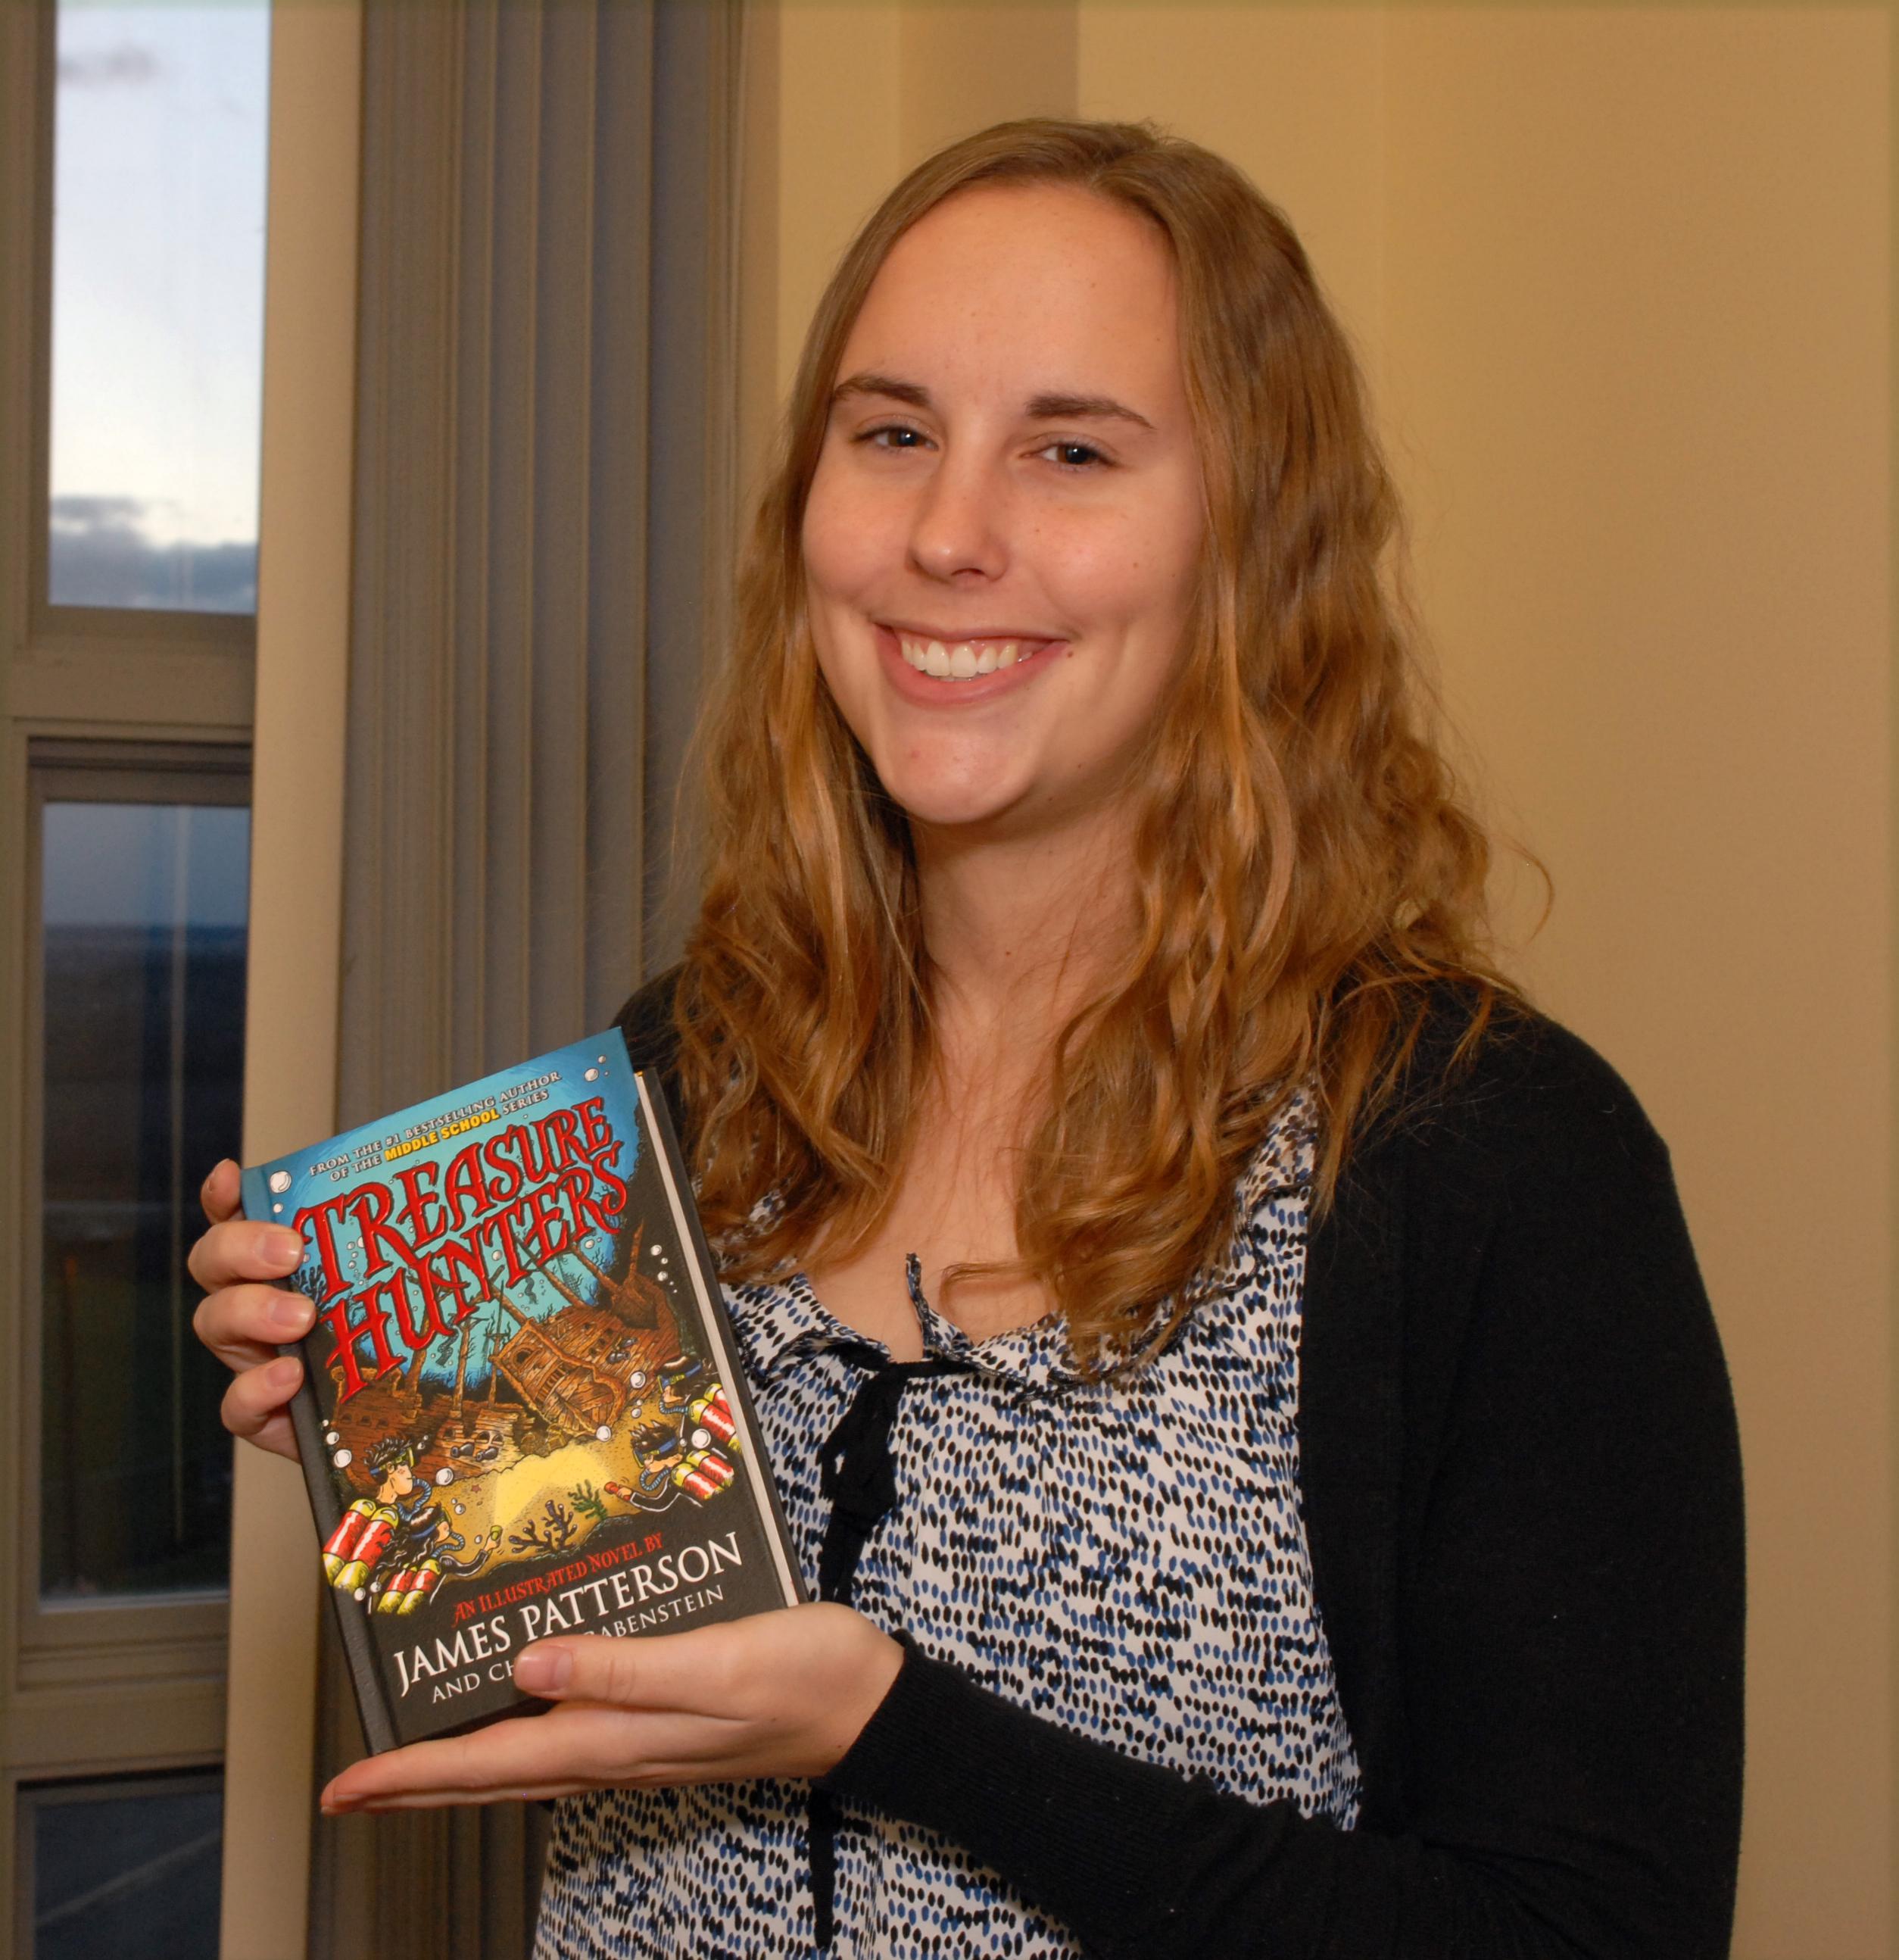 SUNY Geneseo Graduate Student Kristen Bondi from Dansville